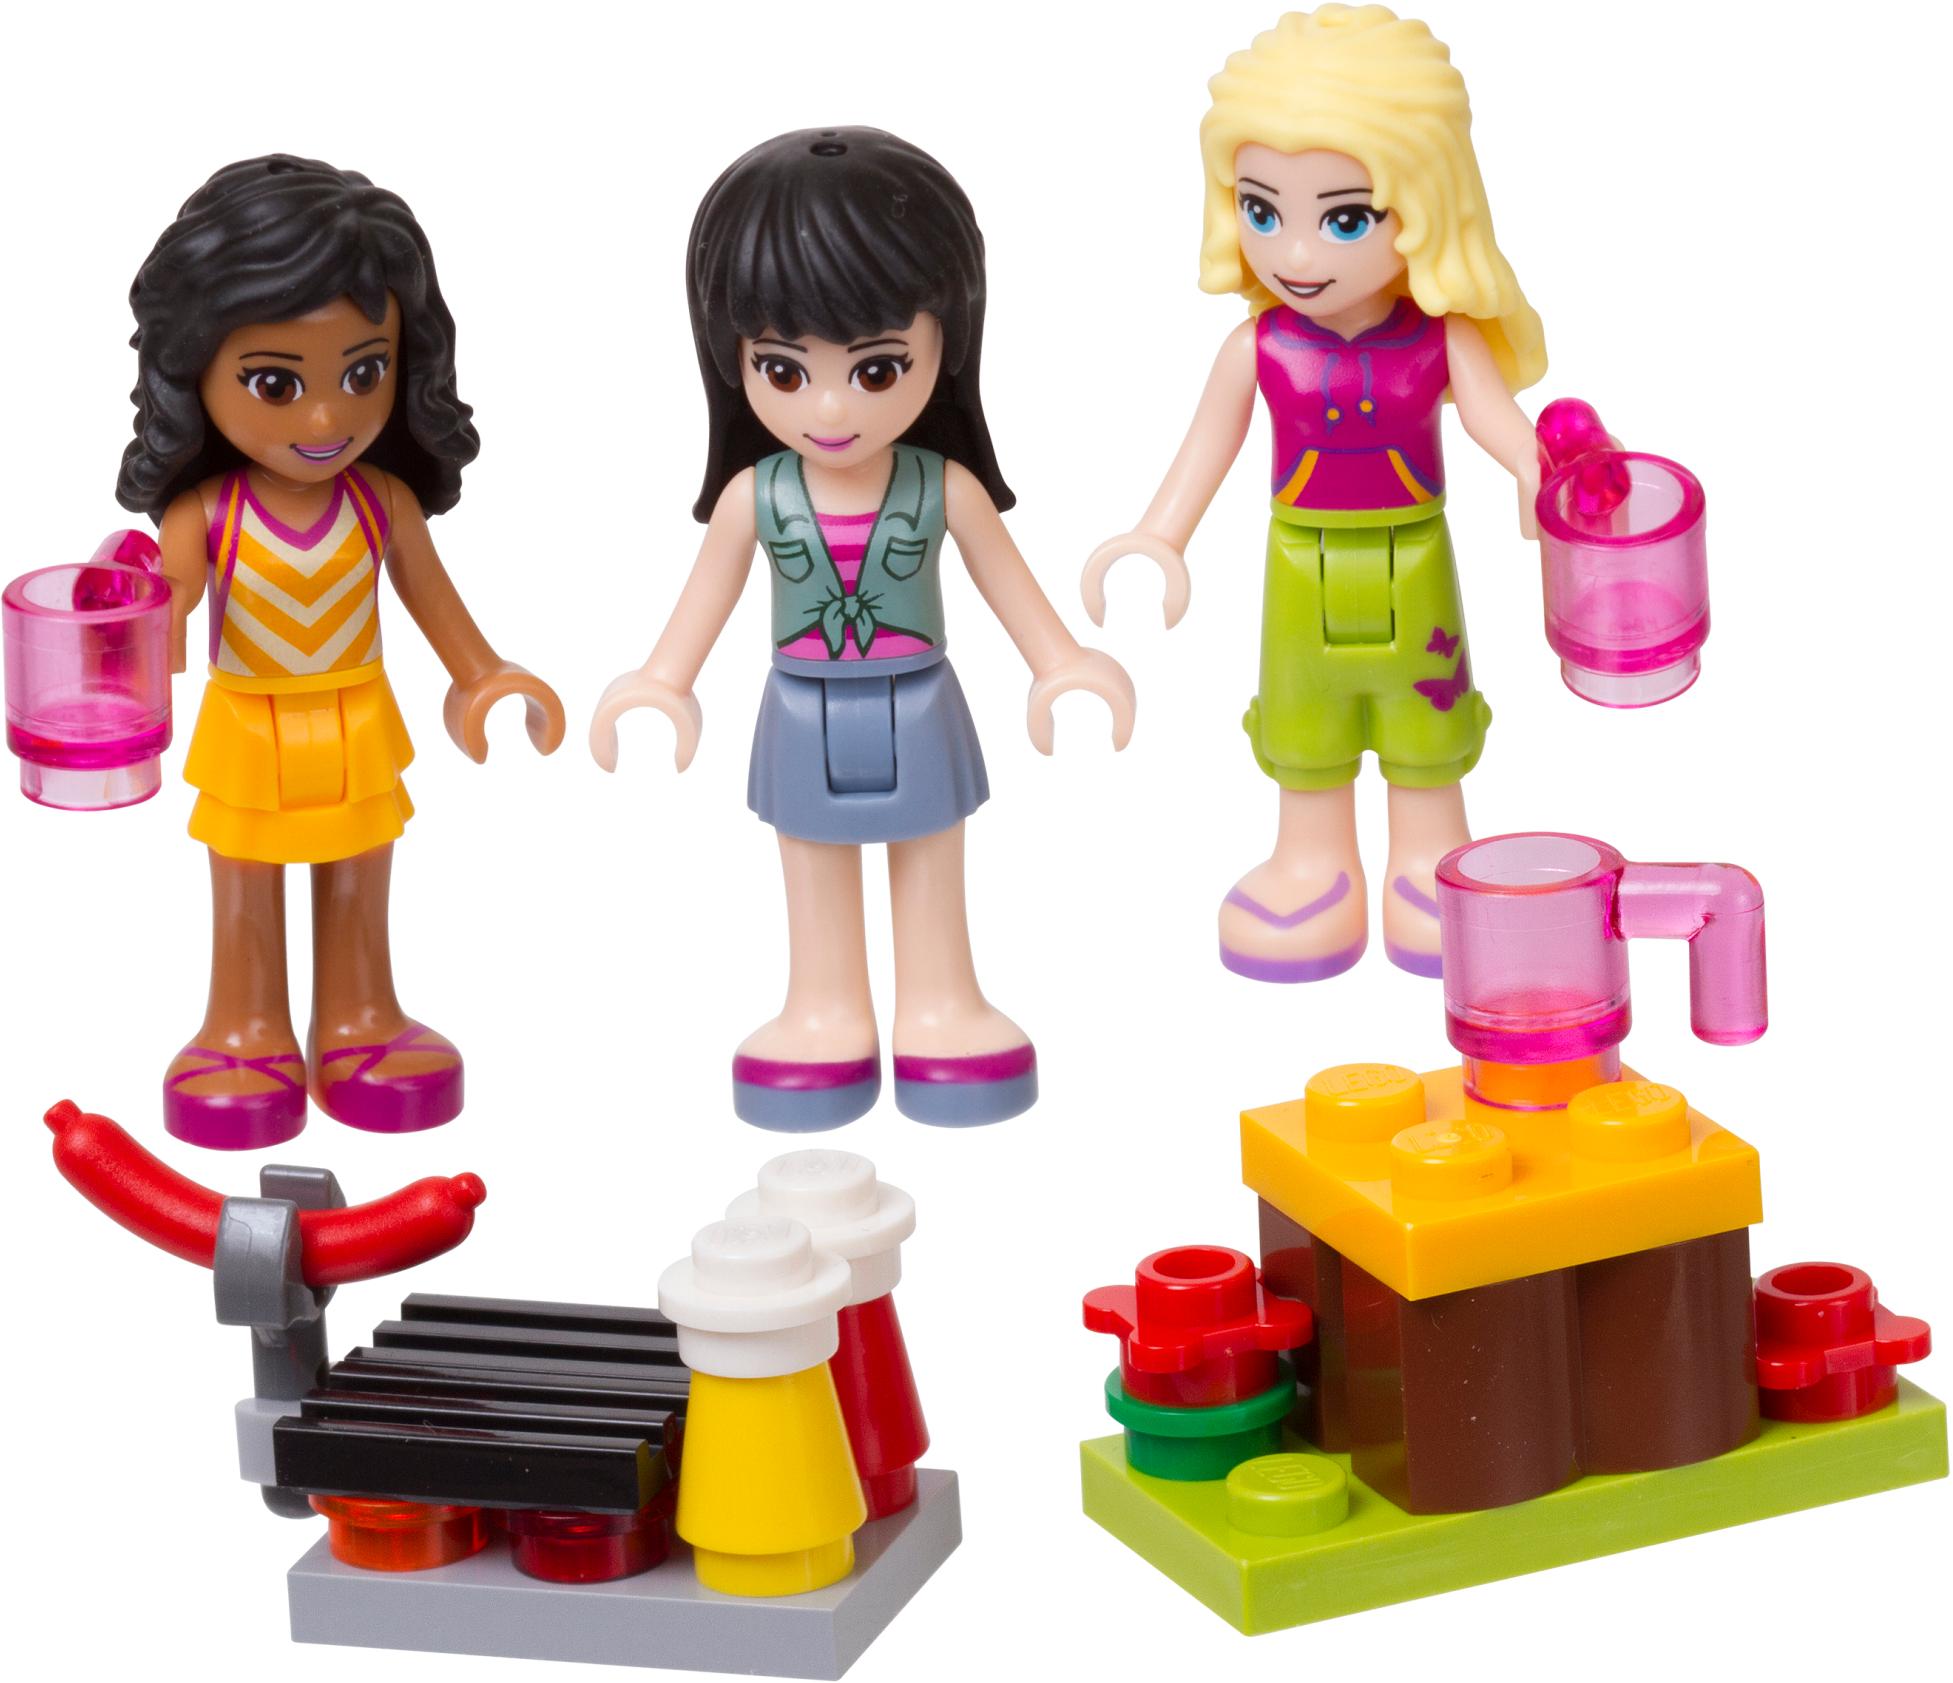 Mini-doll Campsite set